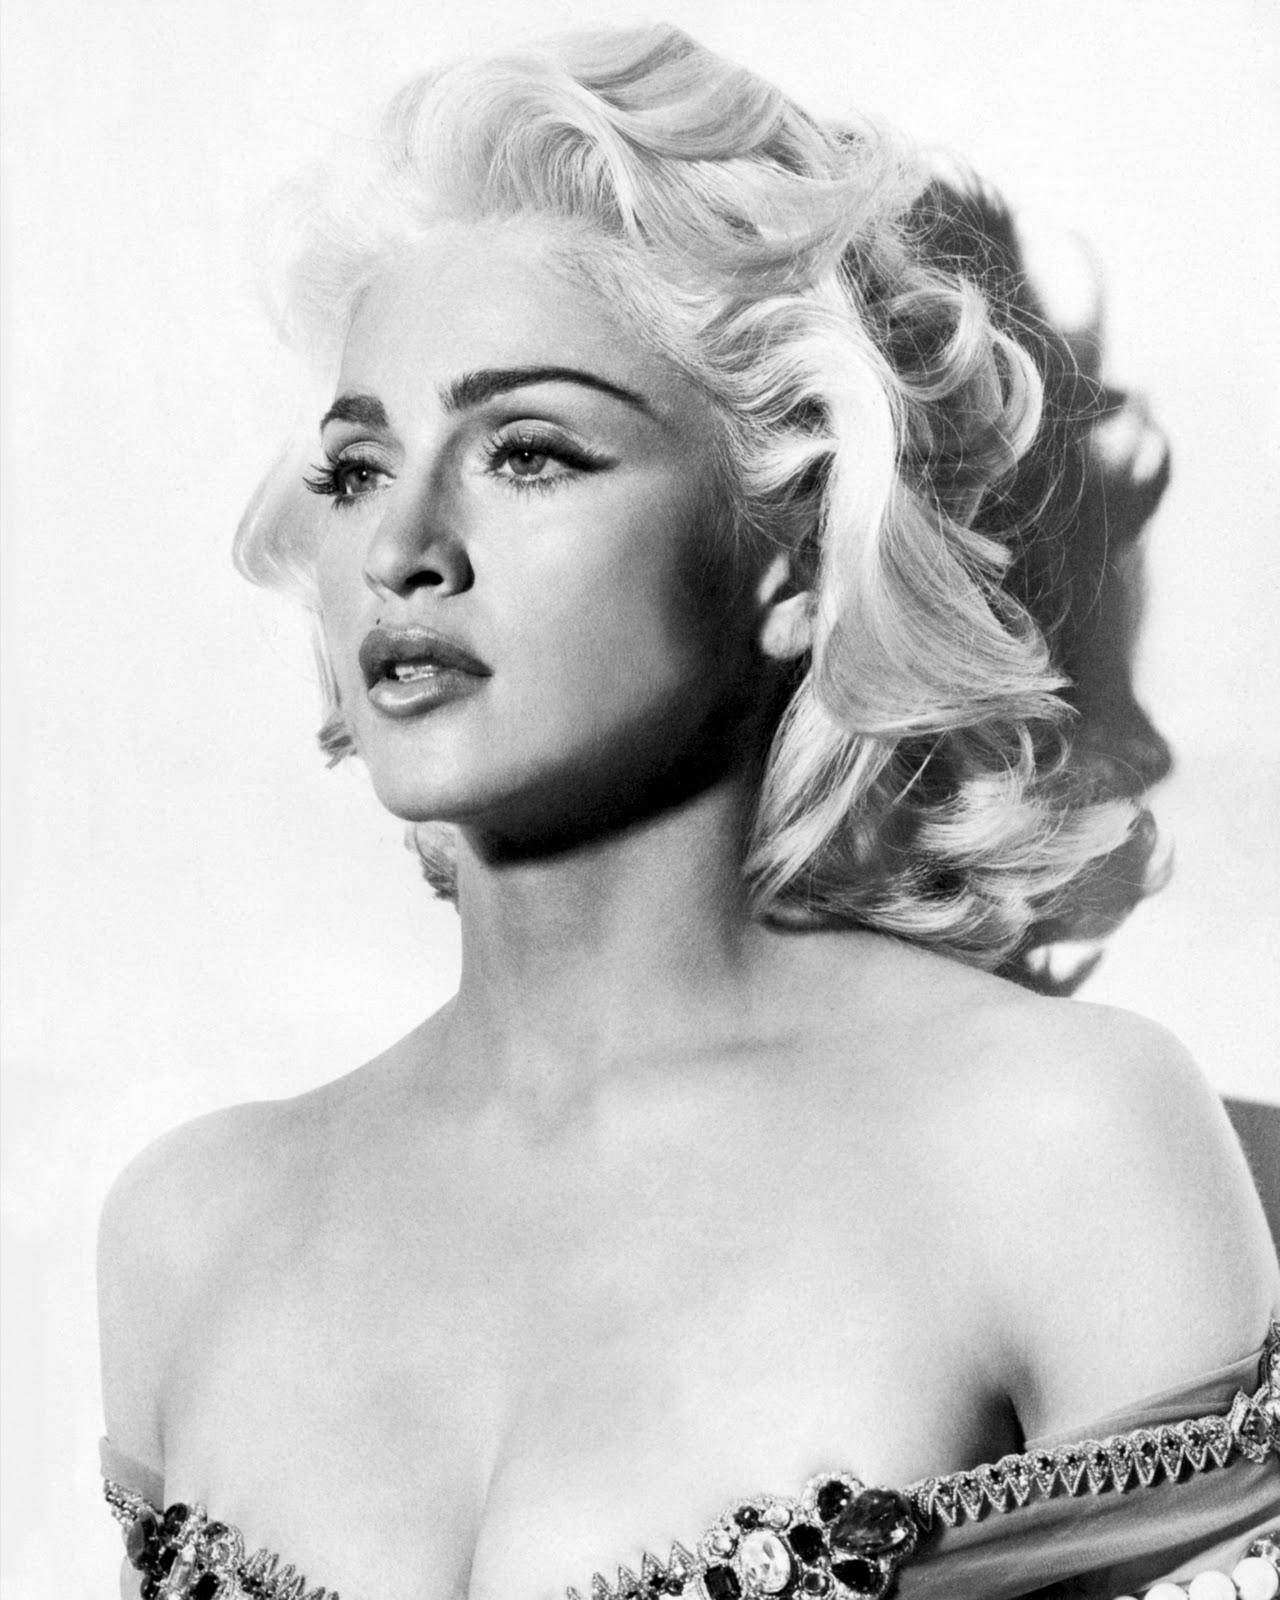 http://2.bp.blogspot.com/_qkdu4uOwe4A/TTIH0GKe9hI/AAAAAAAABnU/SDaYSiCv4SI/s1600/Madonna%2Bby%2BMeisel.jpg